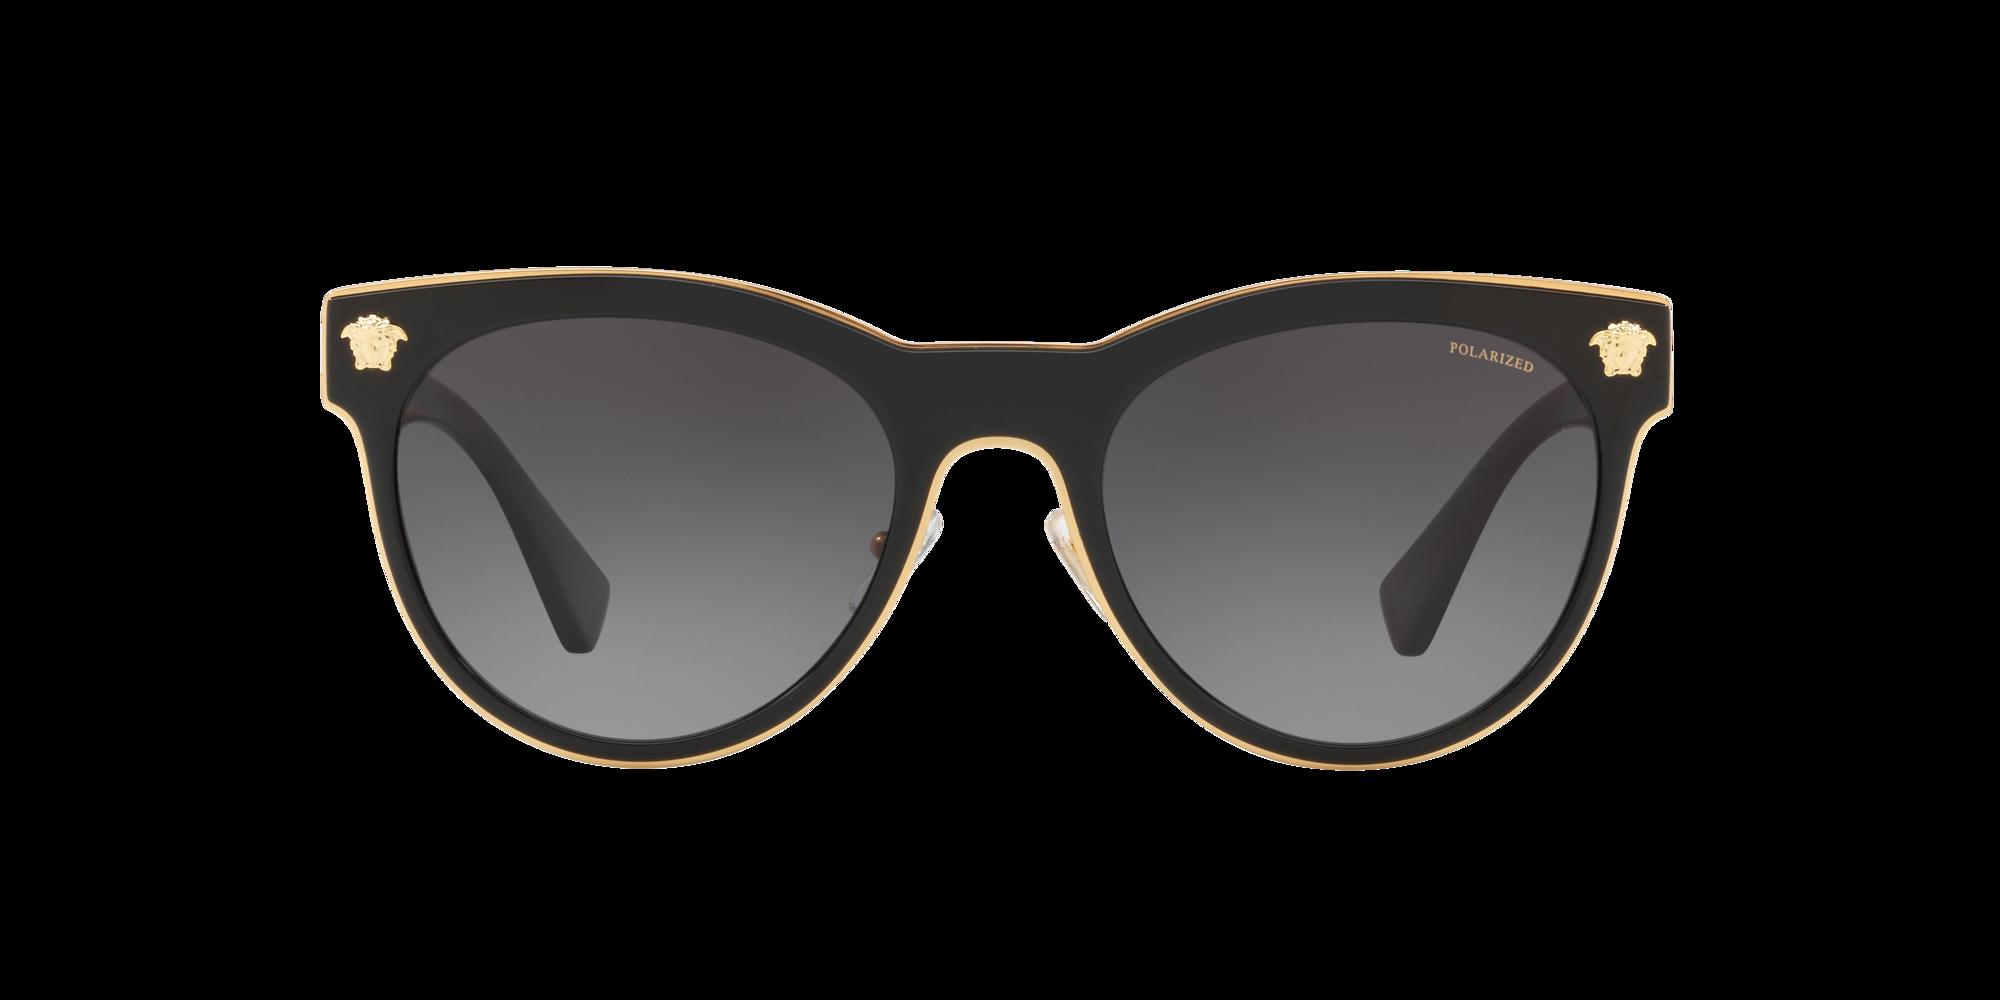 Image for VE2198 54 MEDUSA CHARM from LensCrafters | Glasses, Prescription Glasses Online, Eyewear